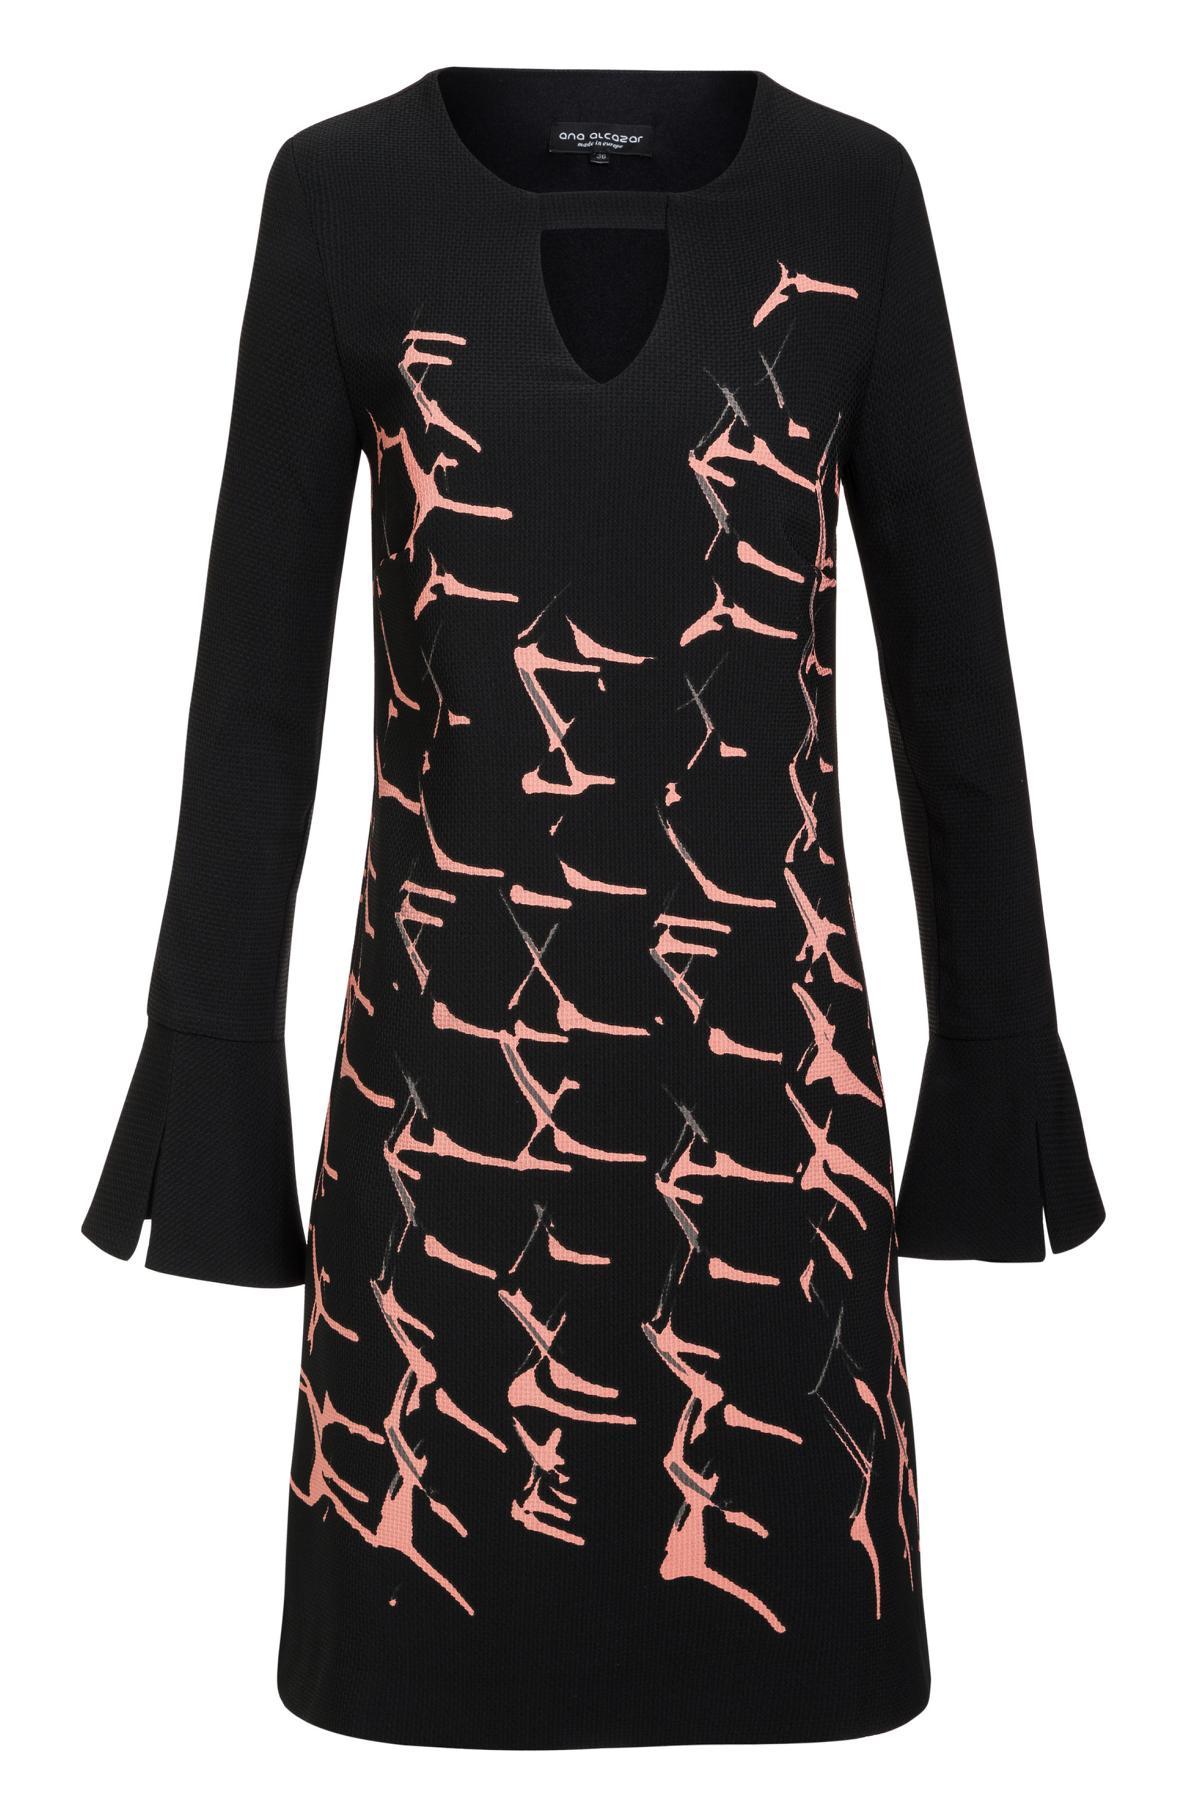 Ana Alcazar A-Linien Kleid Keary Rose